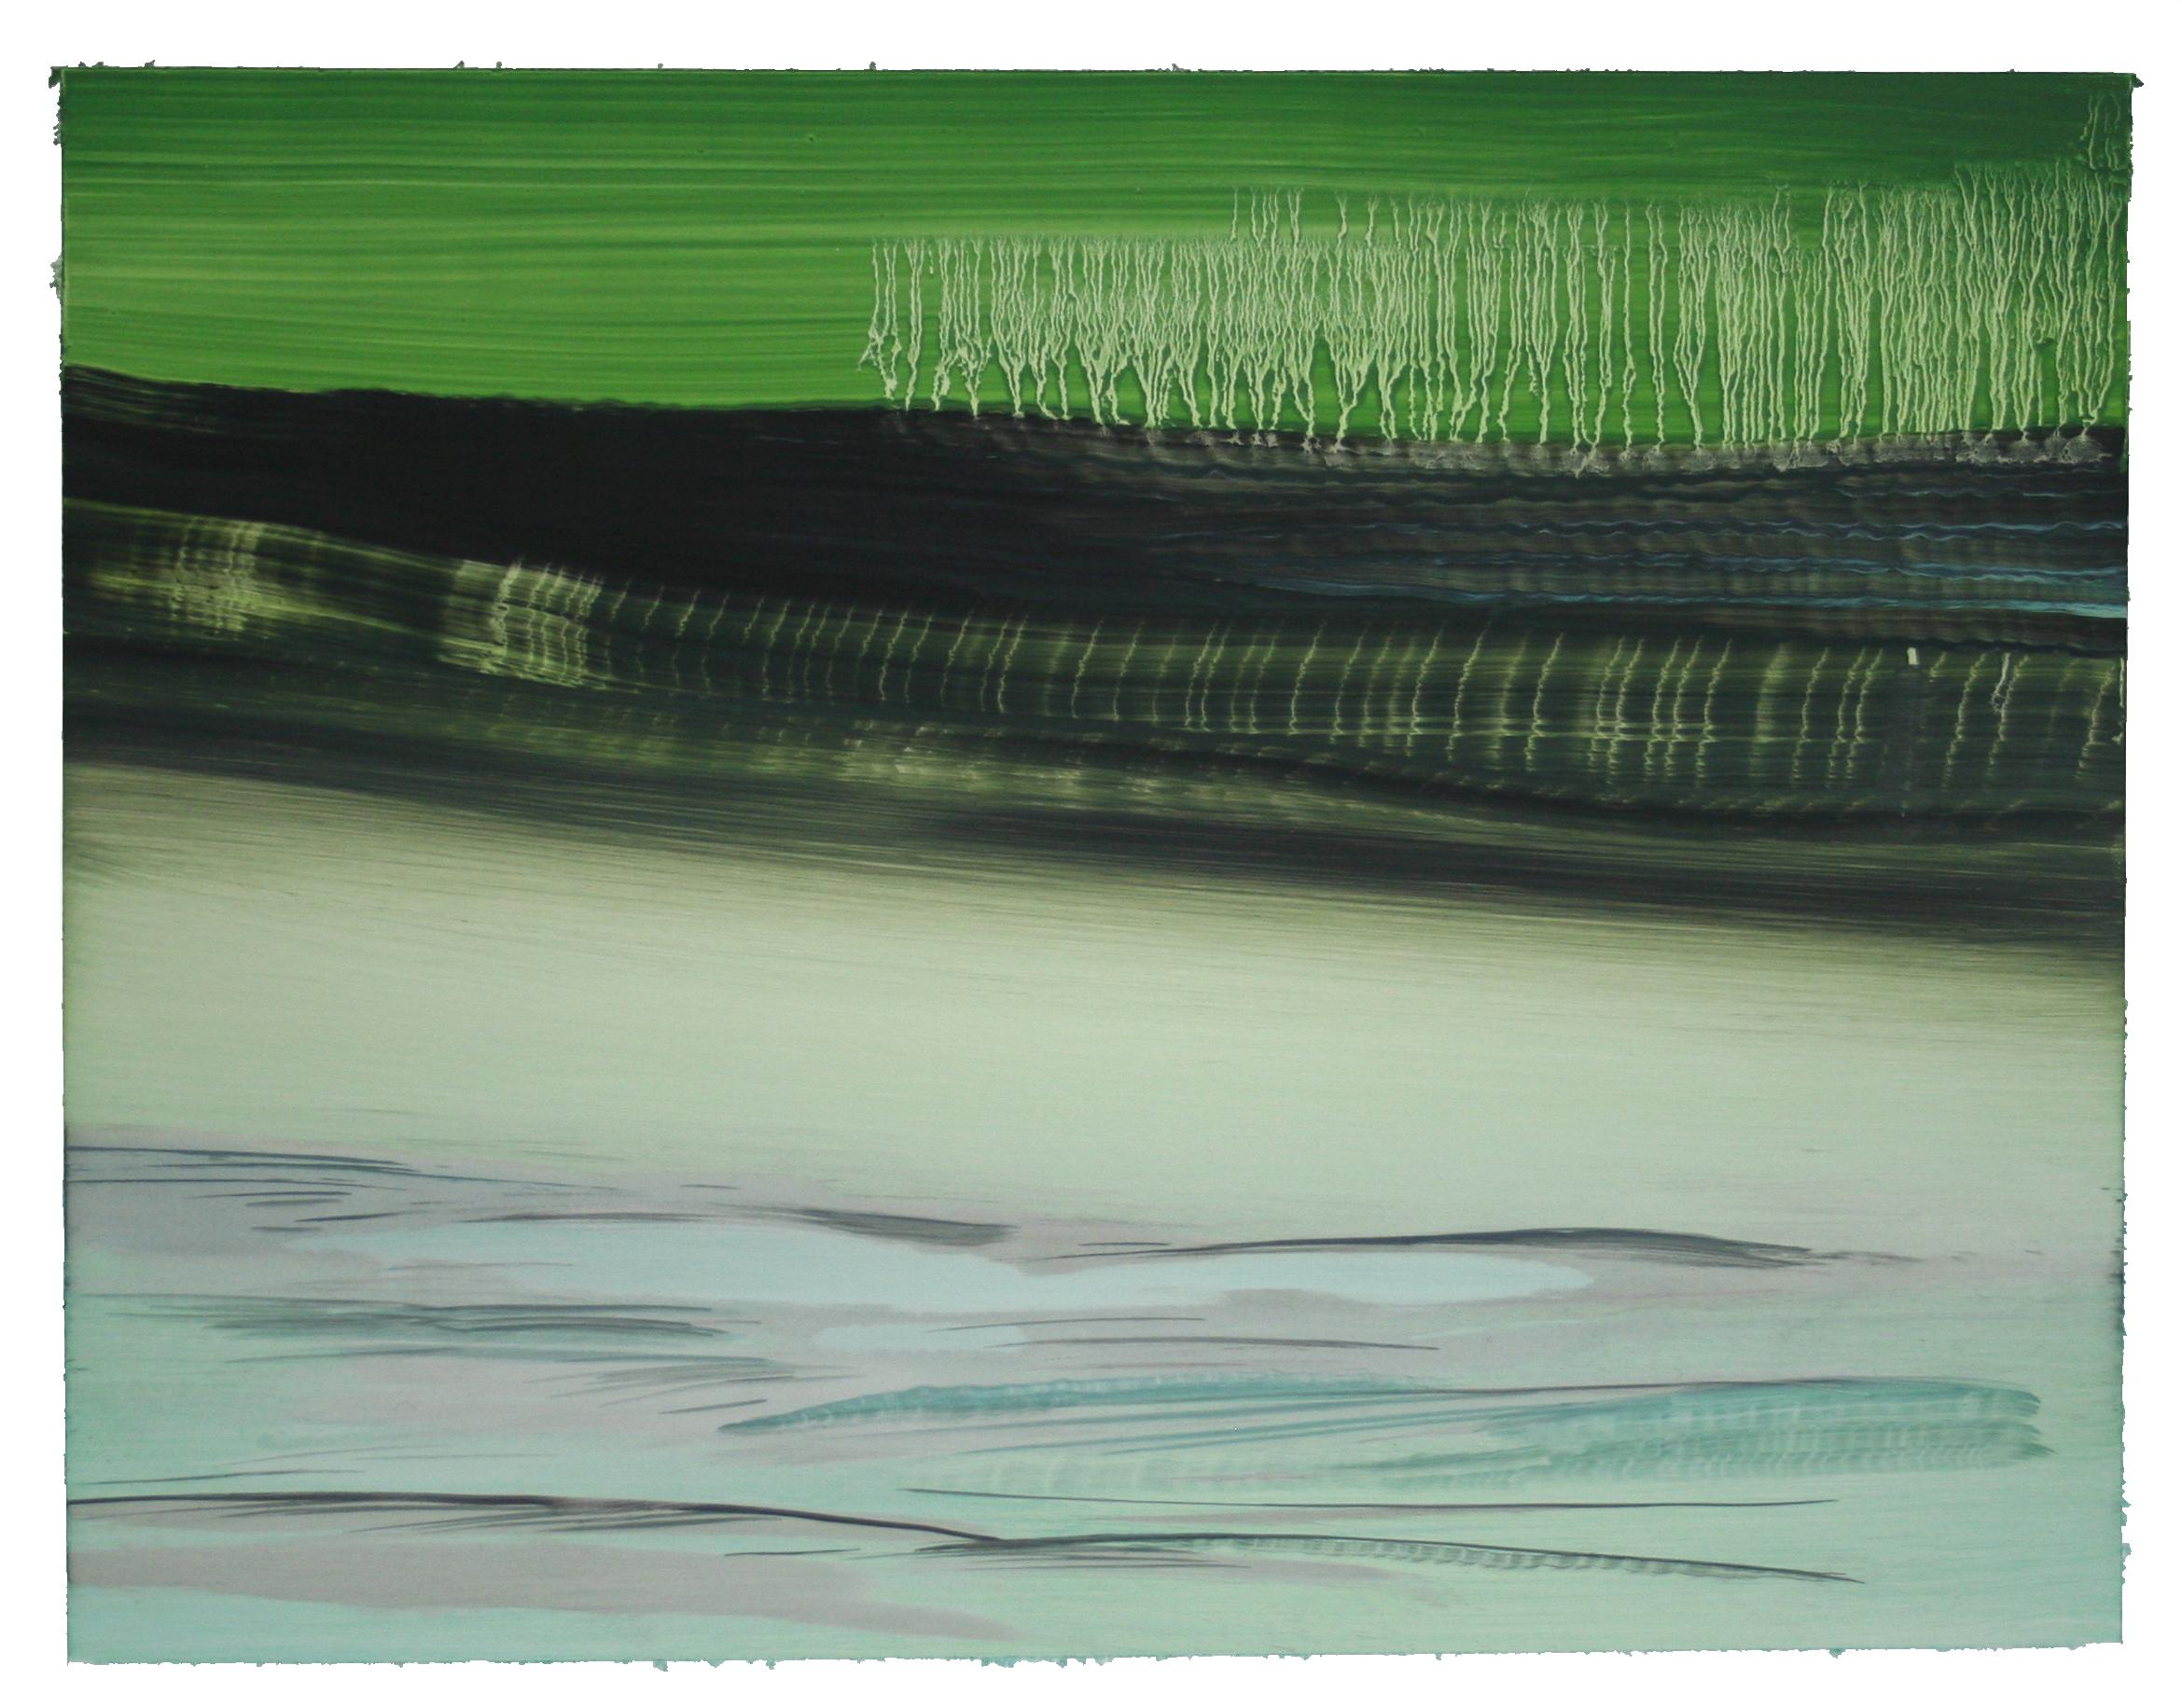 "O.T. (no.59), 11"" x 14"", oil on paper, 2017"